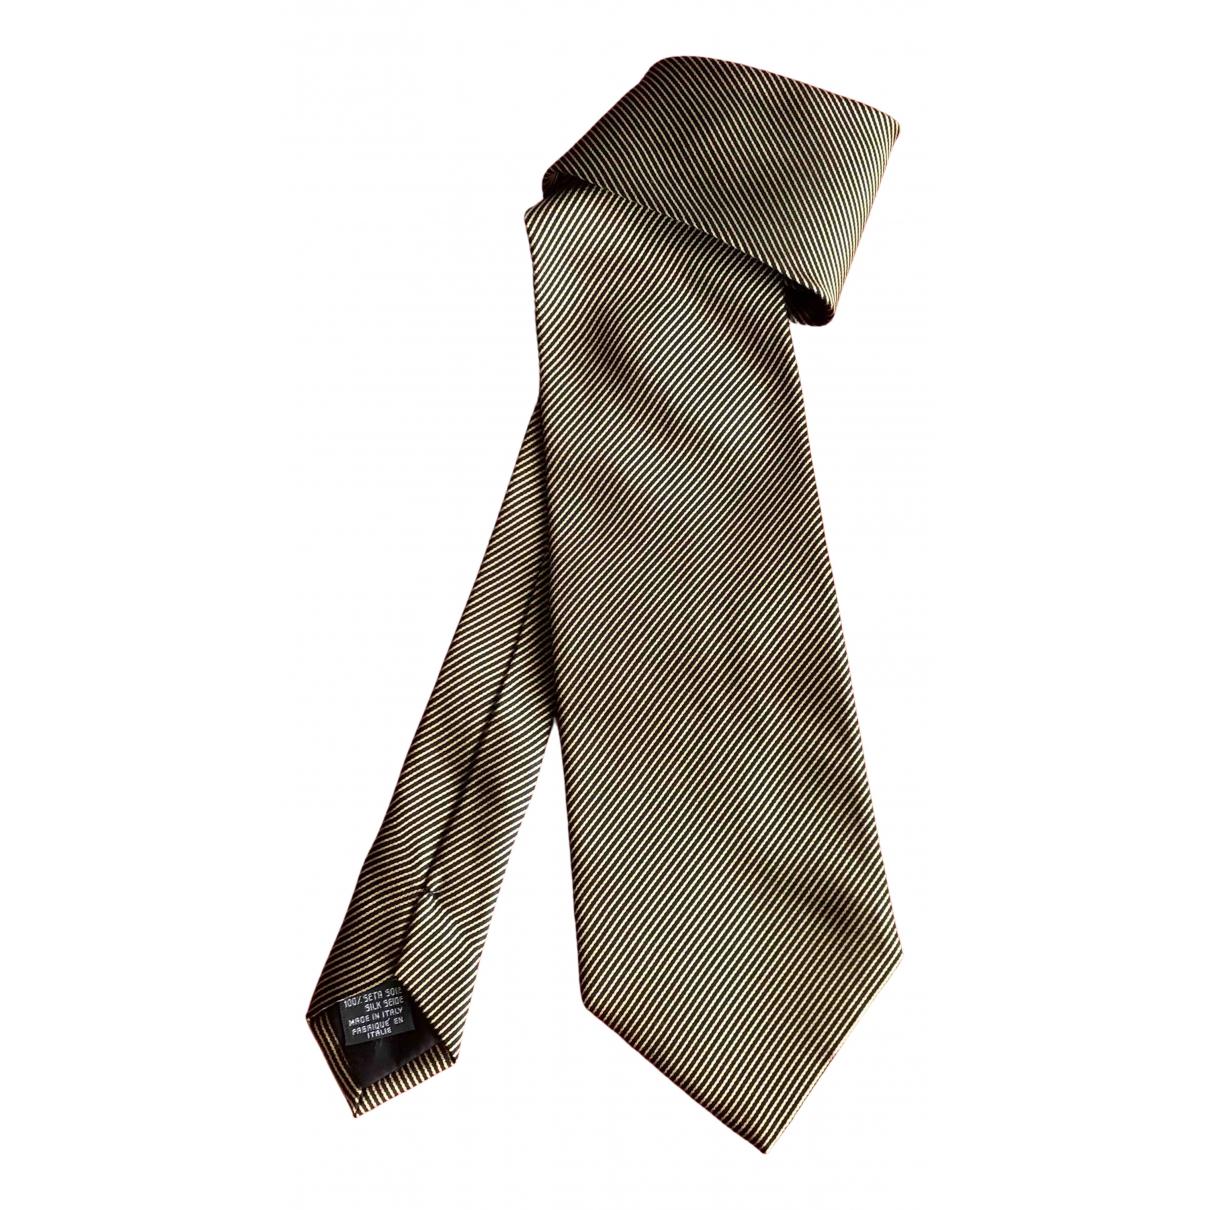 Giorgio Armani N Gold Silk Ties for Men N